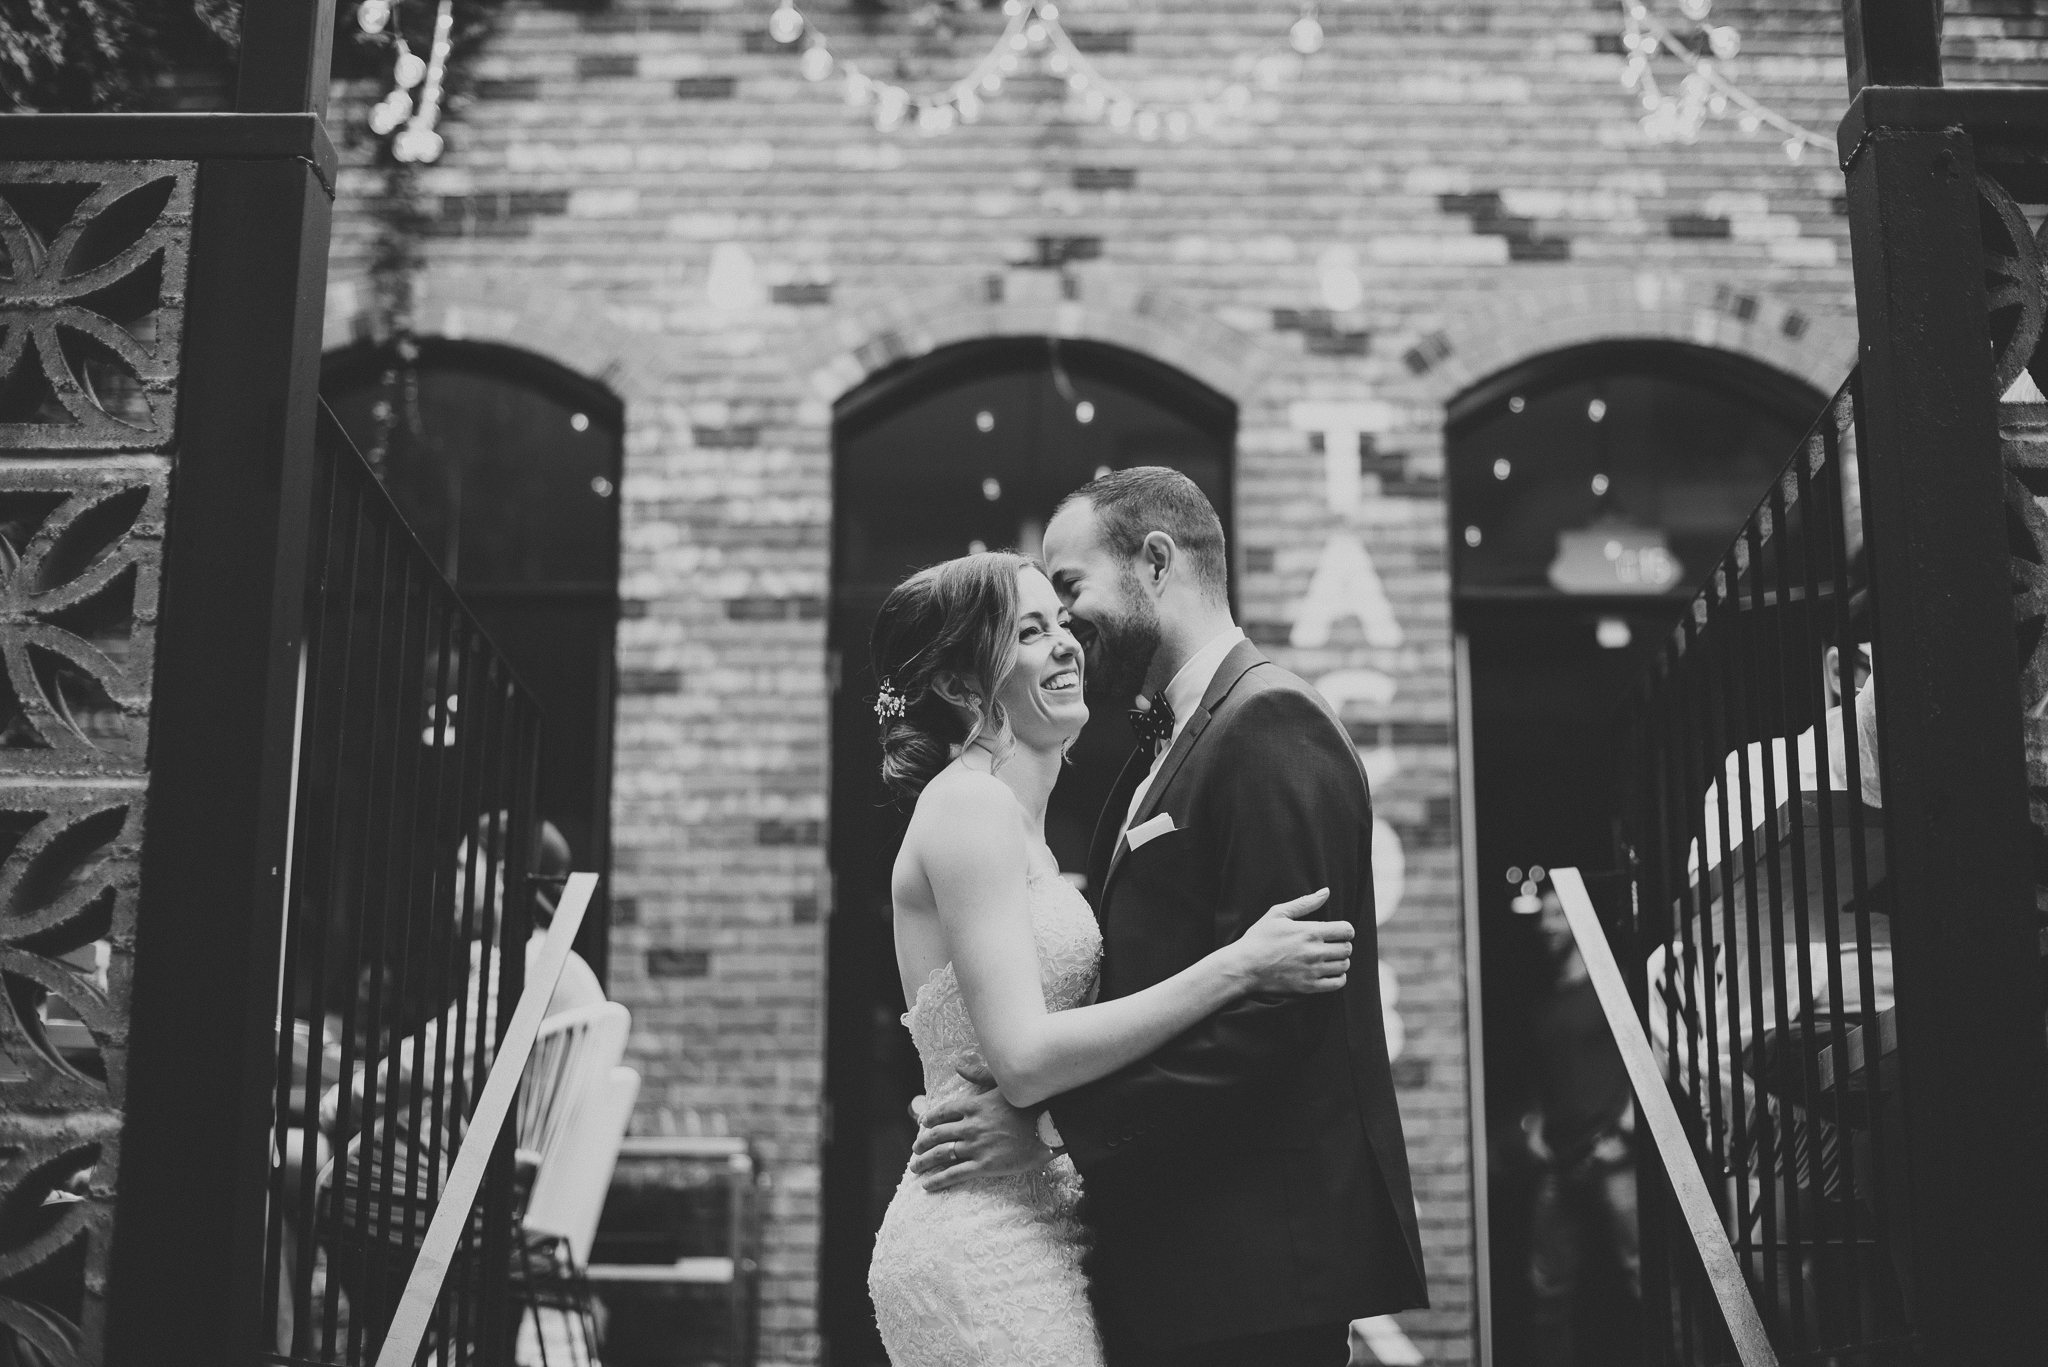 154-permanent-vancouver-wedding-courtneysteven-web-8642.jpg